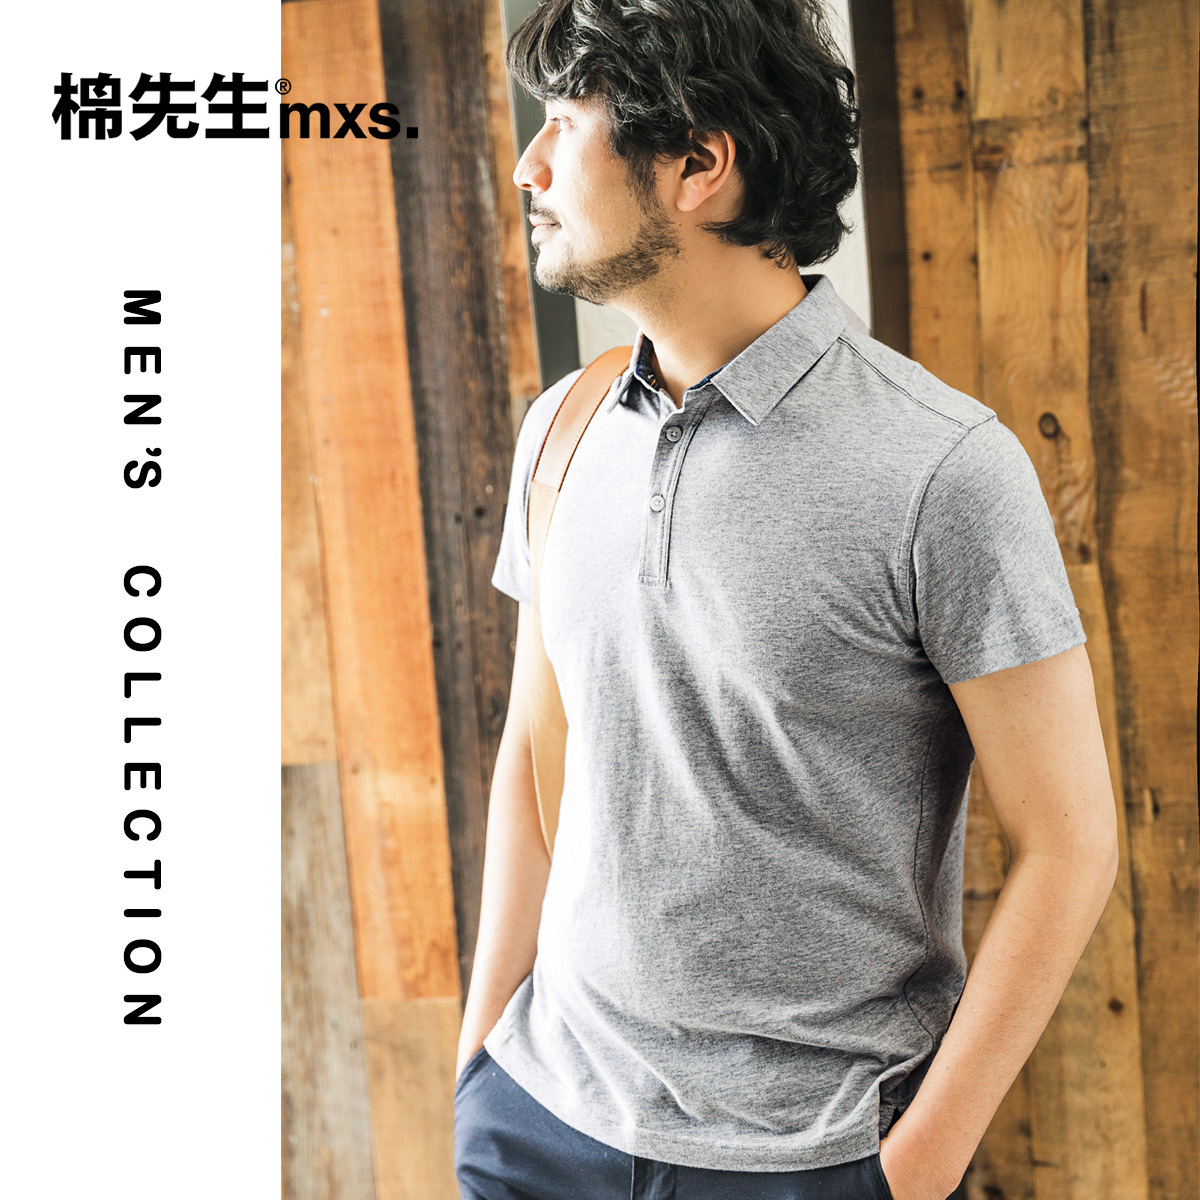 S棉先生男装 夏季新款男士珠地网眼短袖polo衫 纯色翻领T恤男半袖